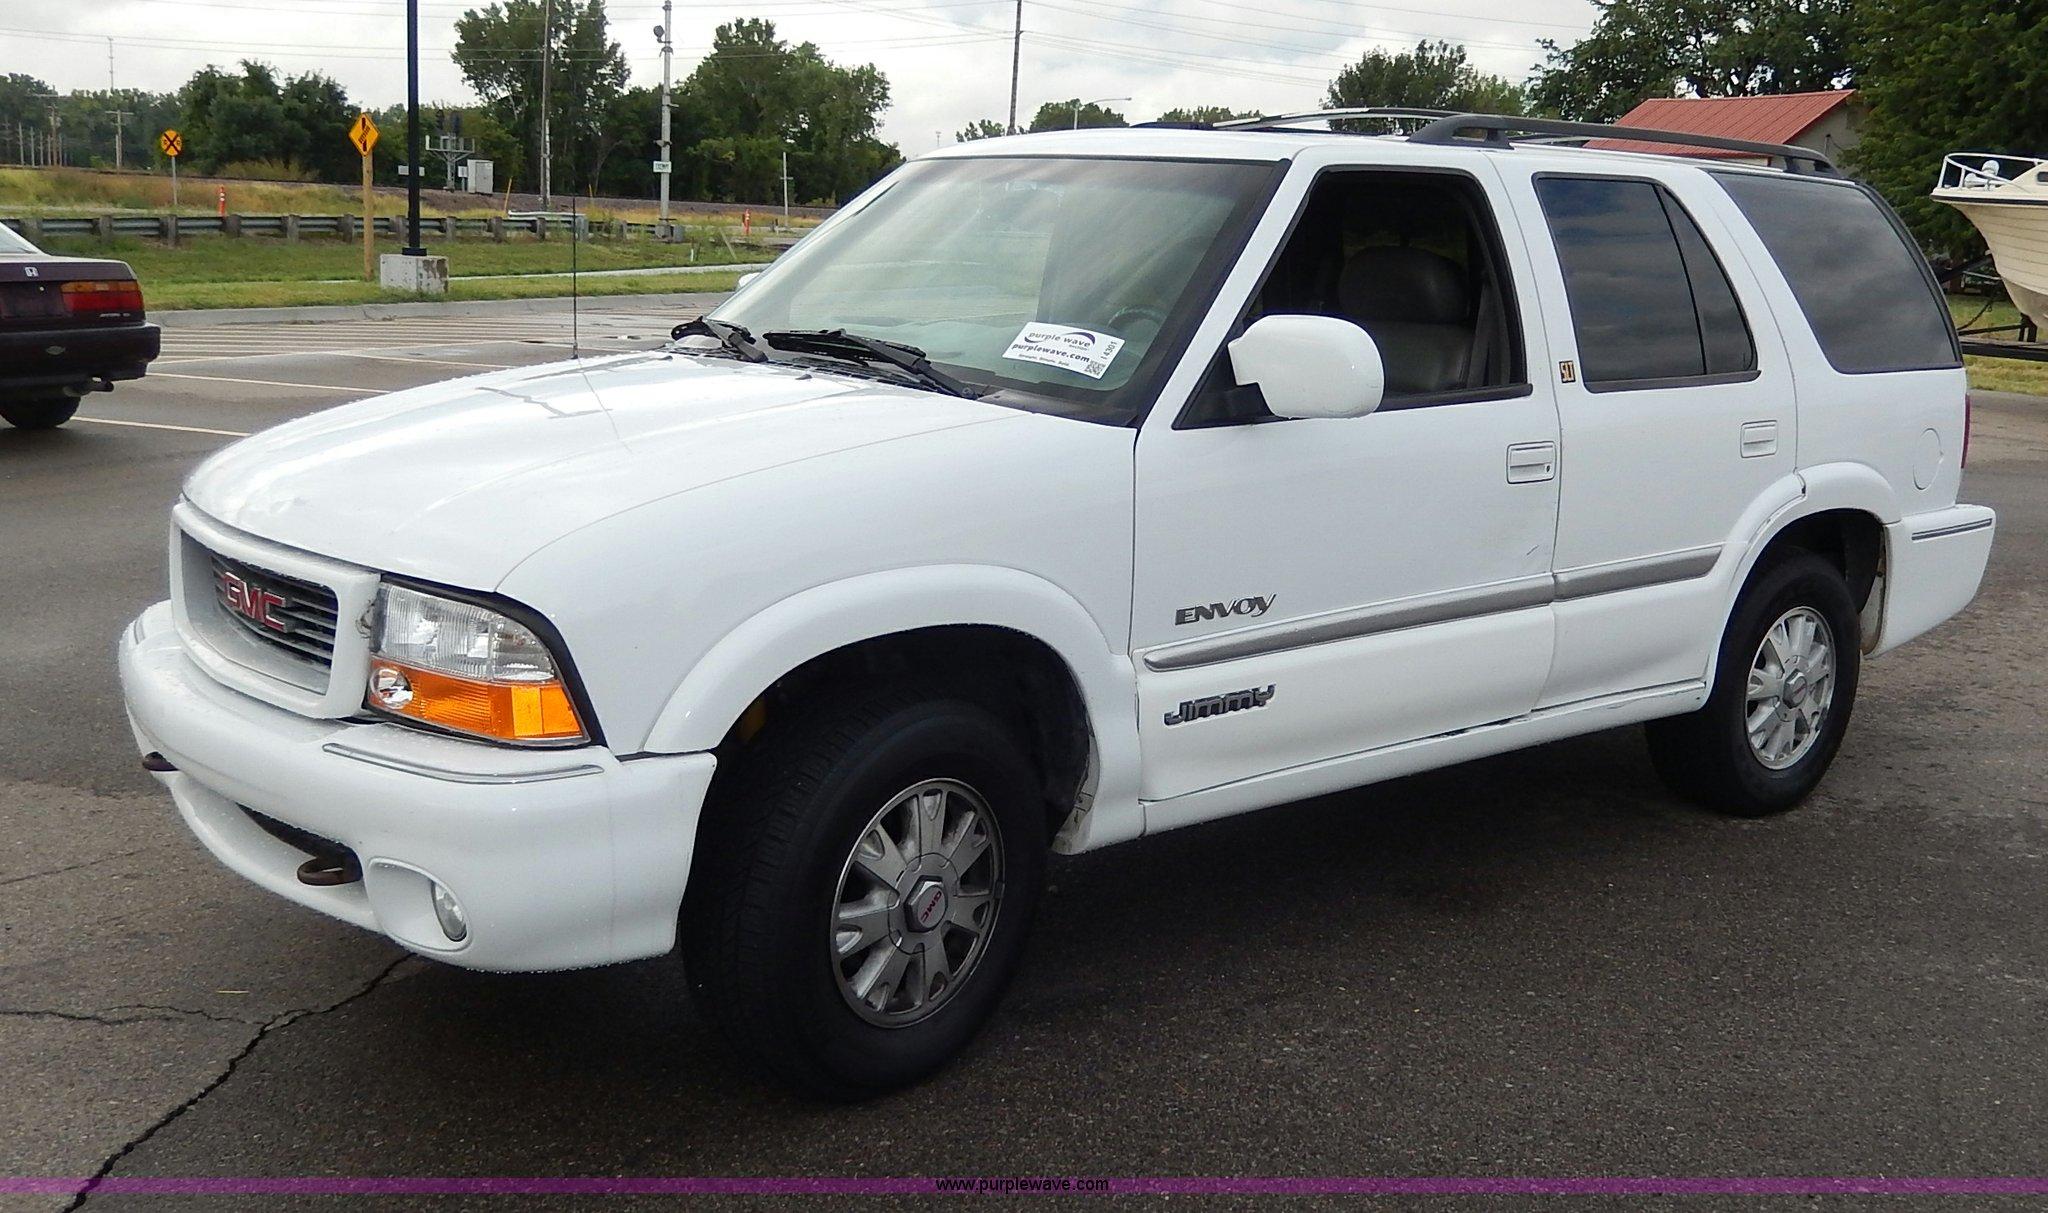 sale jimmy mcg gmc vehicles hd for